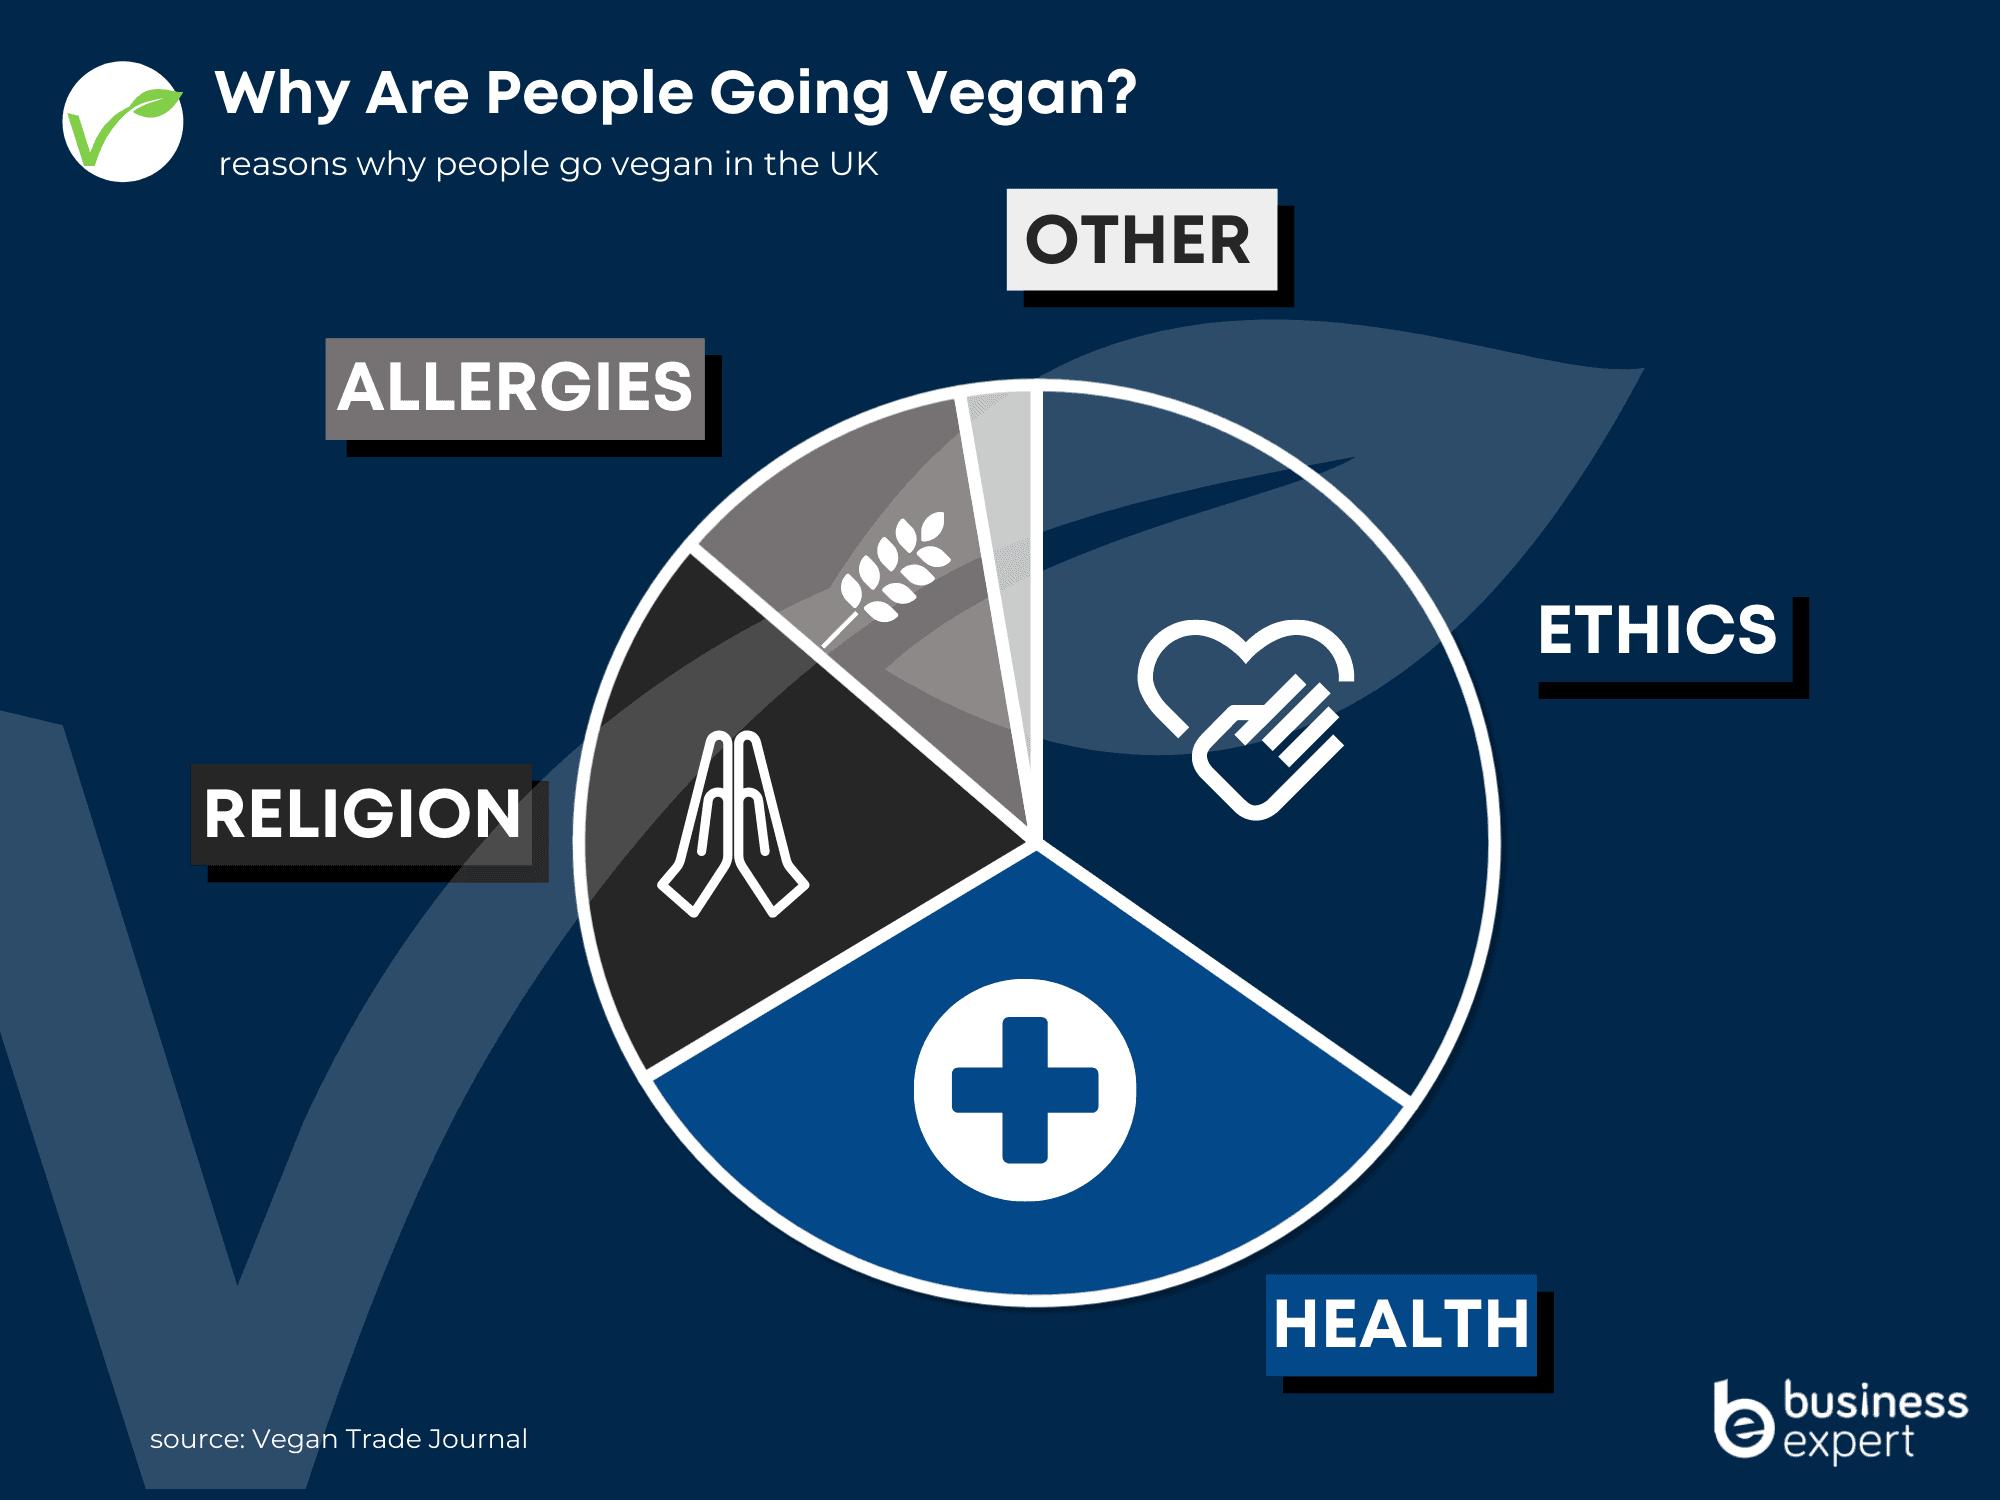 vegan business expert